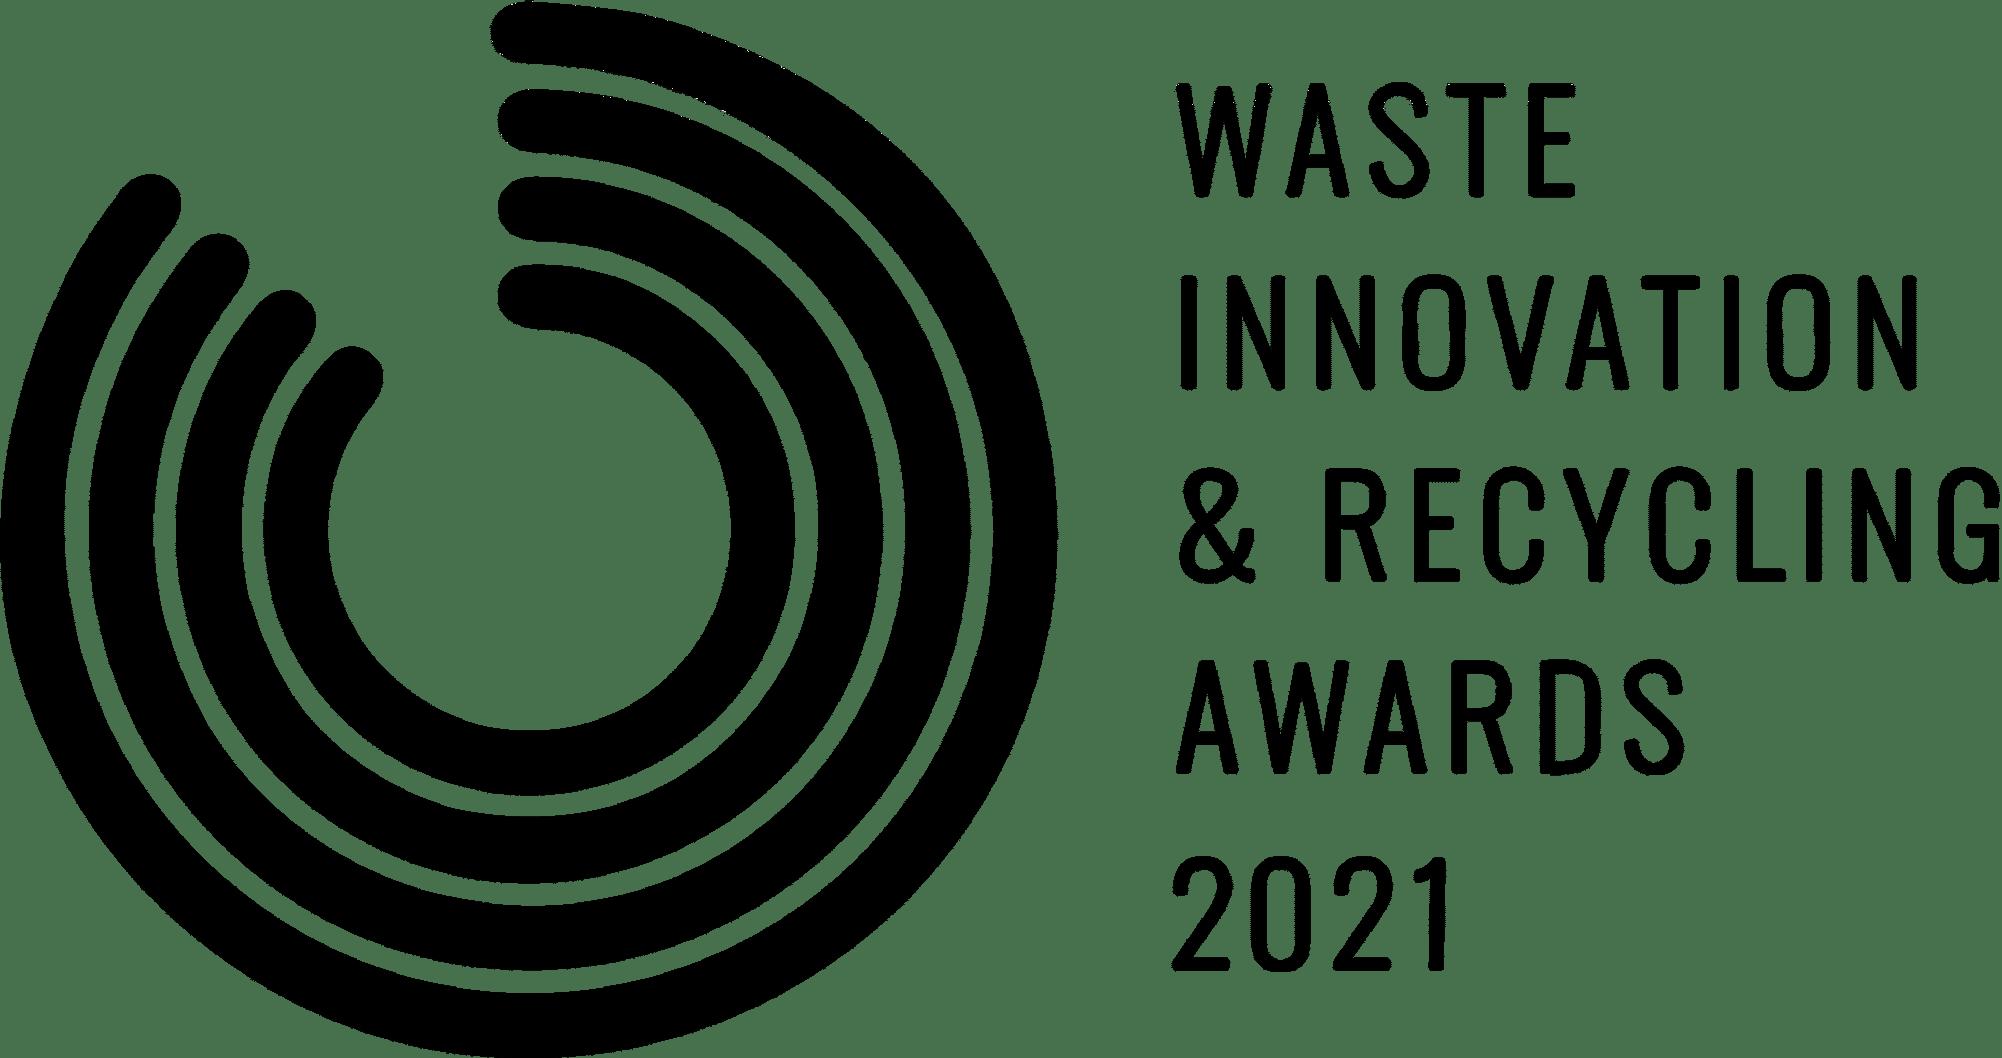 Waste Innovation & Recycling Awards